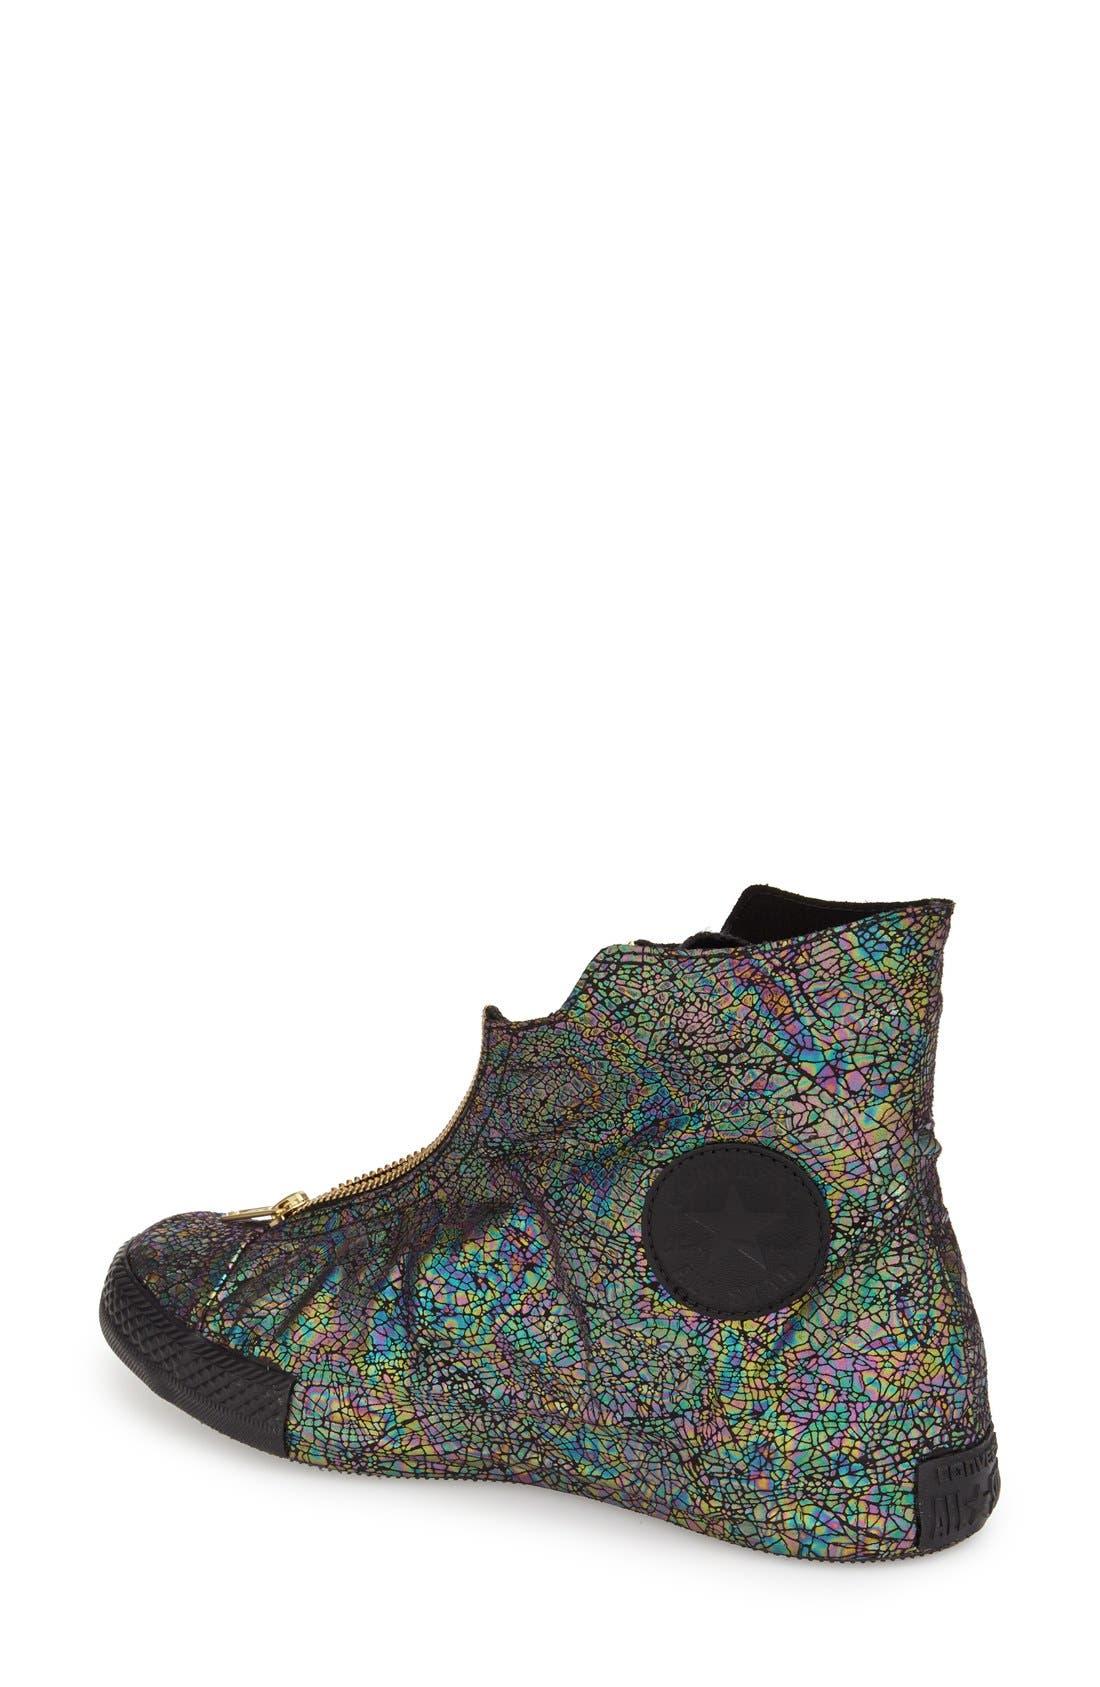 Alternate Image 2  - Converse Chuck Taylor® All Star® 'Oil Slick Shroud' High Top Sneaker (Women)